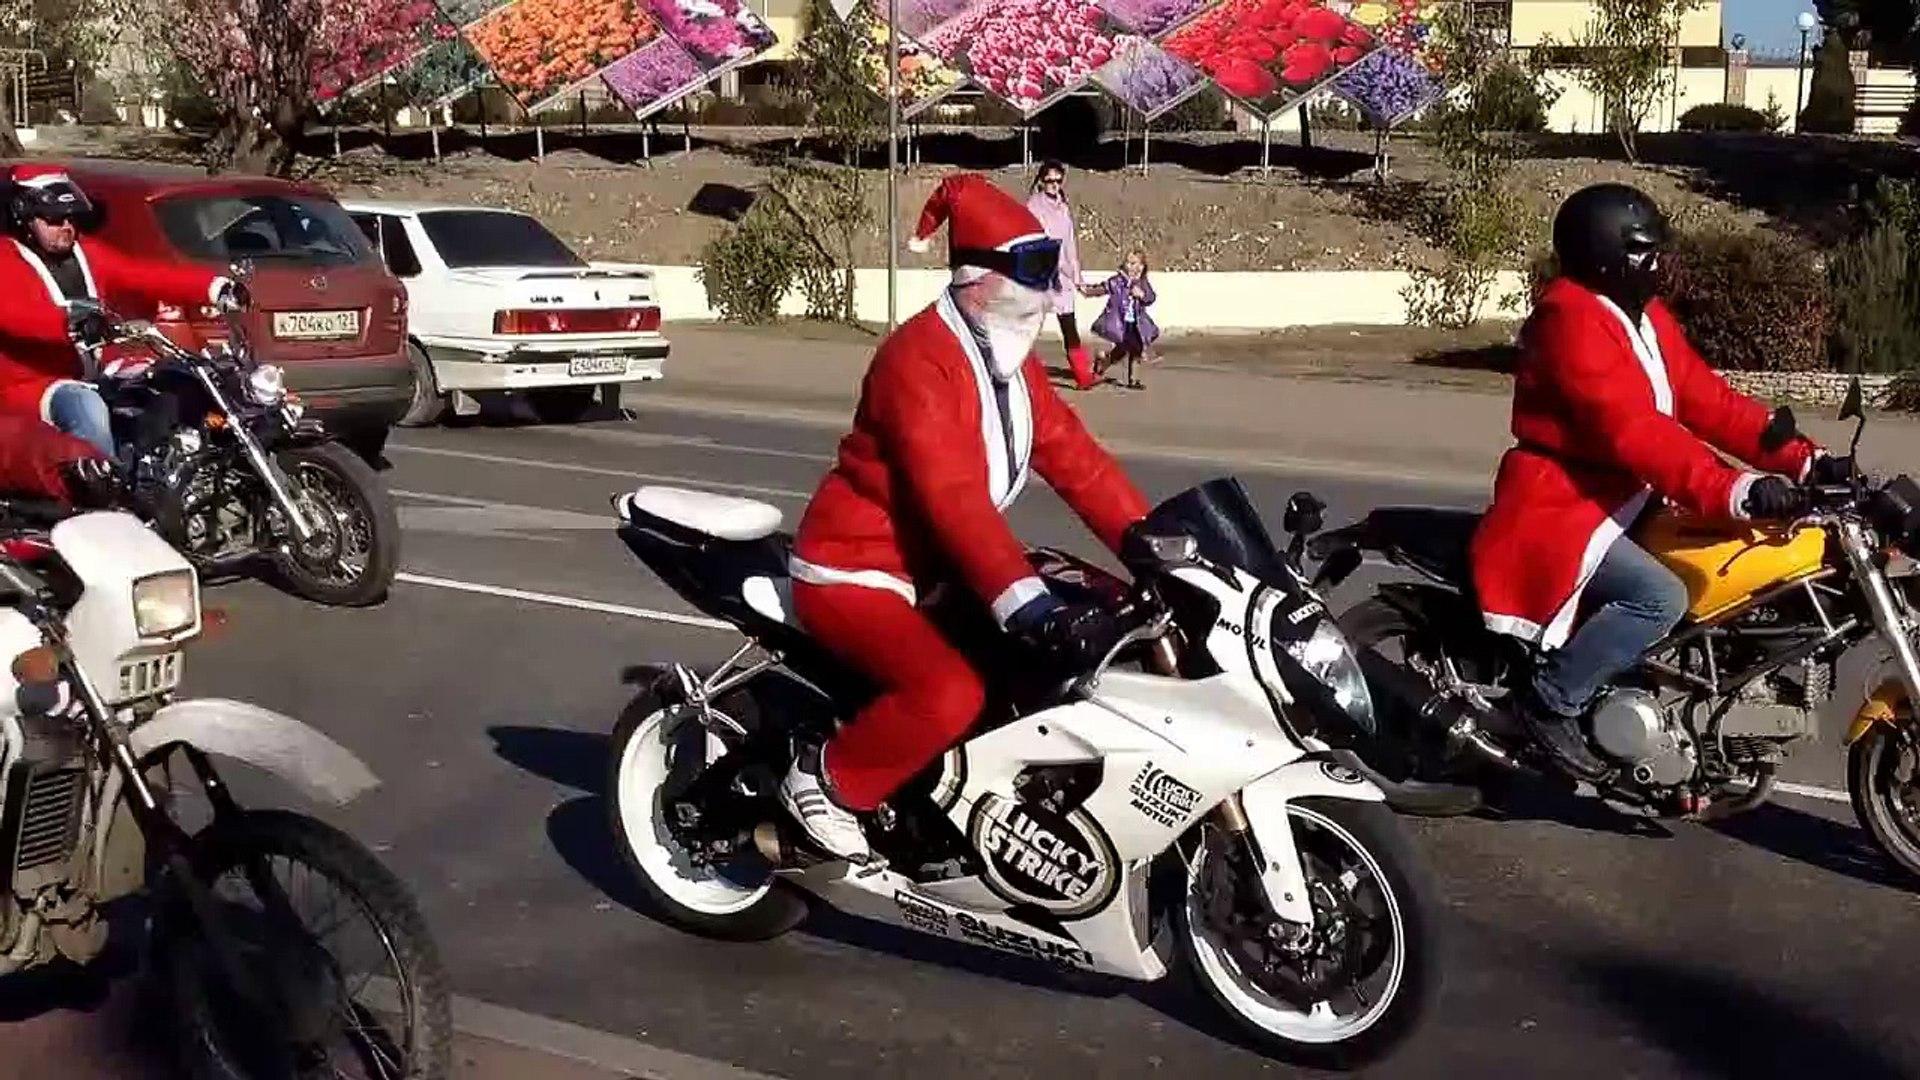 Парад Дед Морозов. 28 декабря 2013 года. Сочи